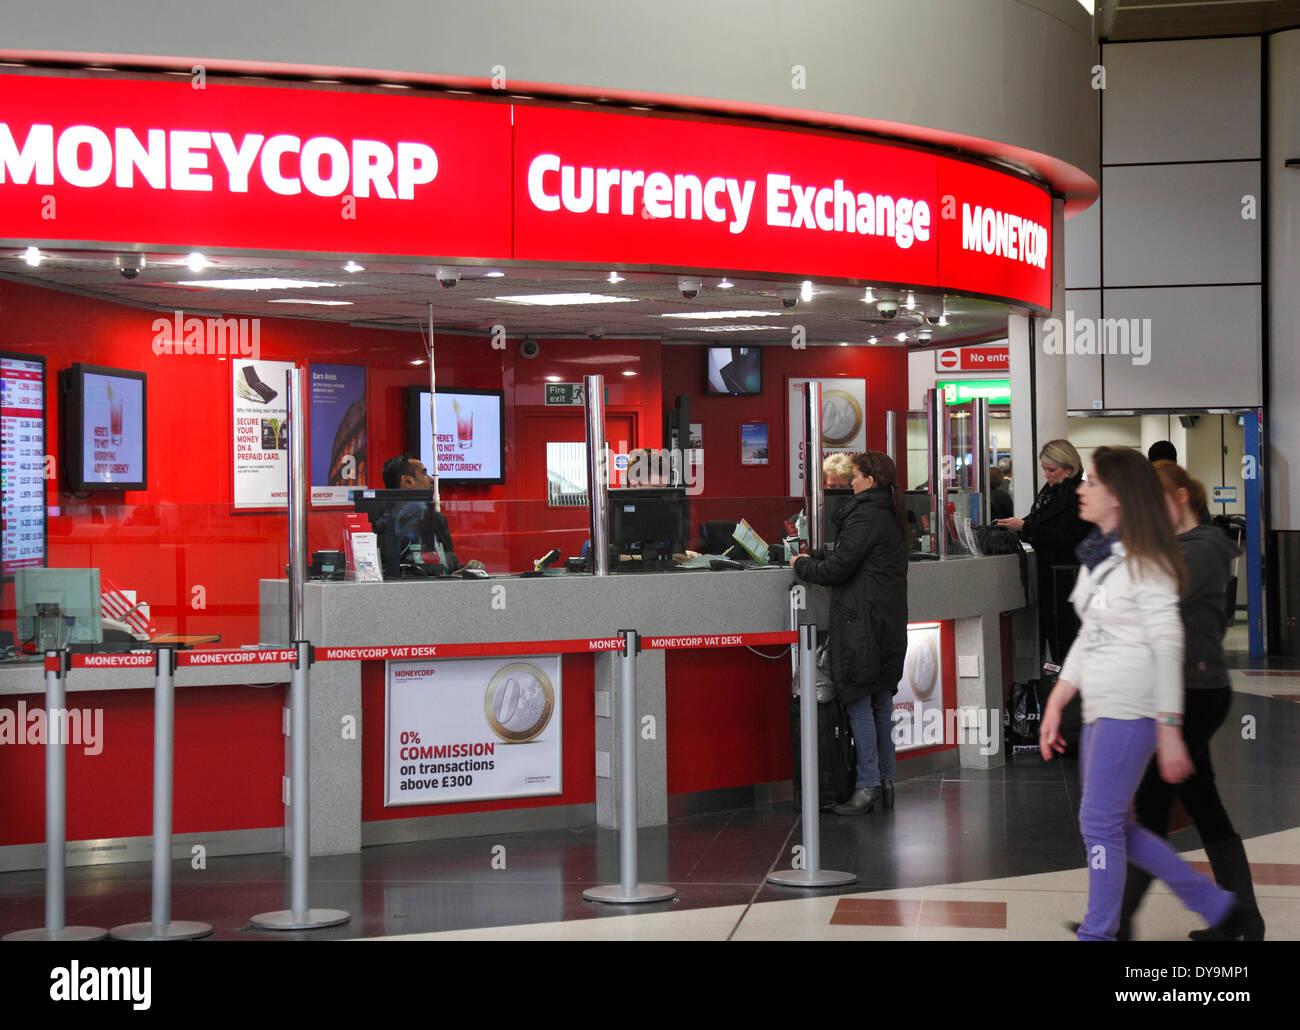 Bureau exchange stockfotos & bureau exchange bilder alamy